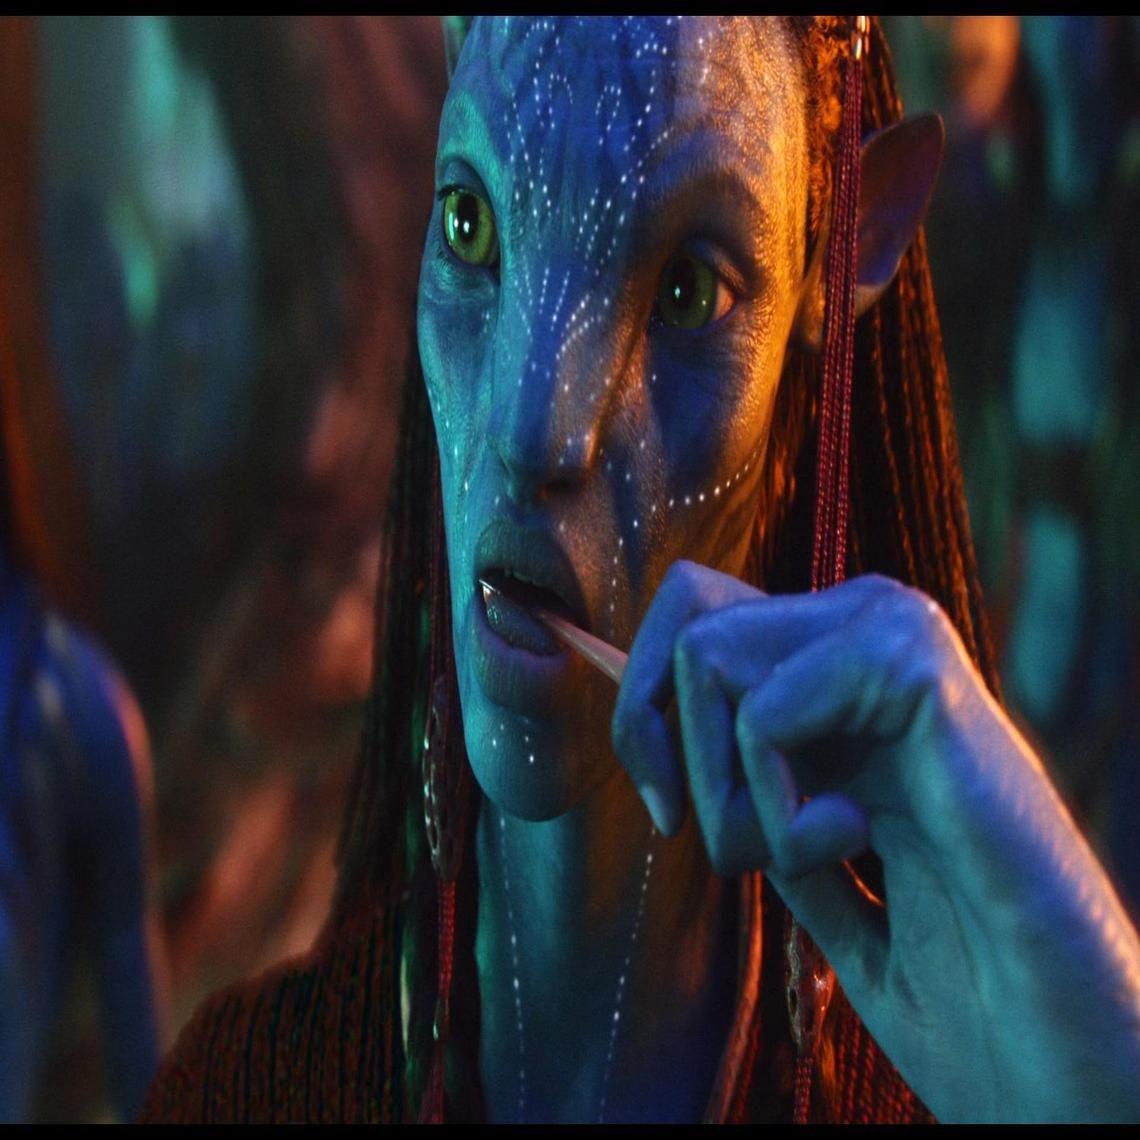 Cool Wallpaper Movie Avatar 2 - 4761948f45c826487a3f16edbe1779b7  Graphic_806856.jpg